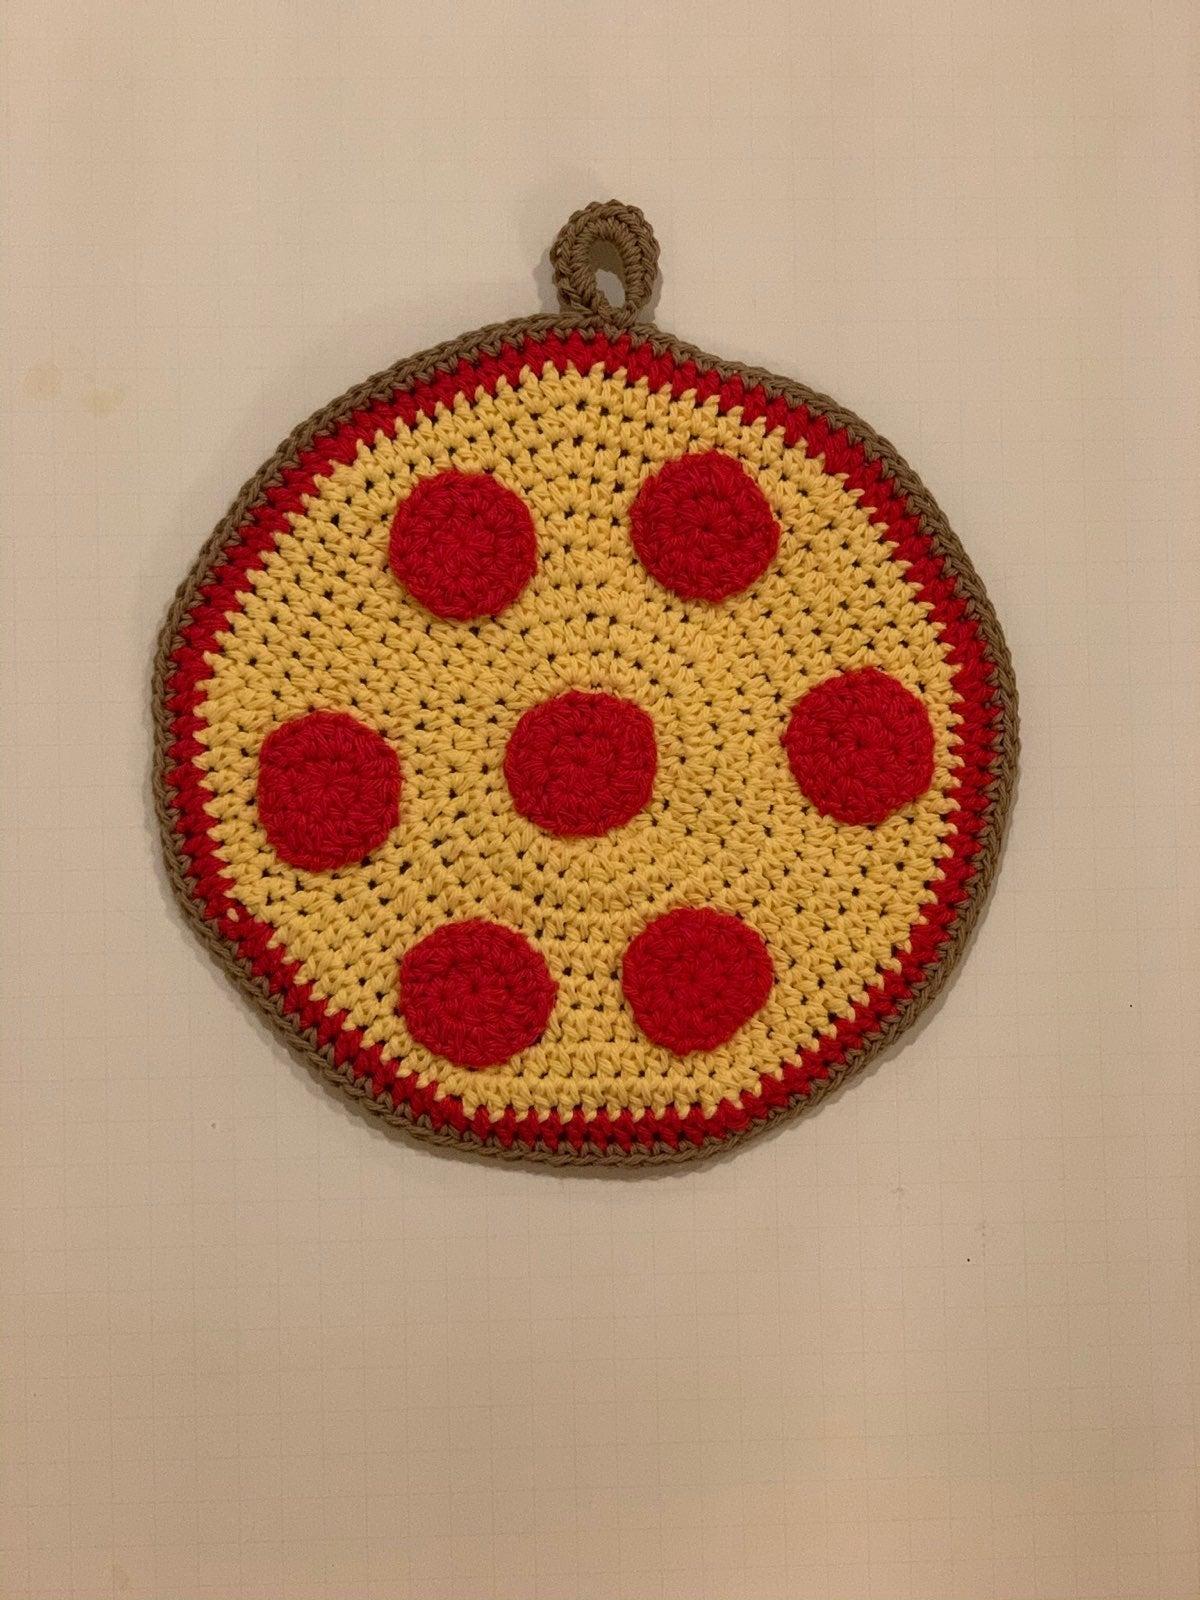 Handmade Pepperoni Pizza Potholder